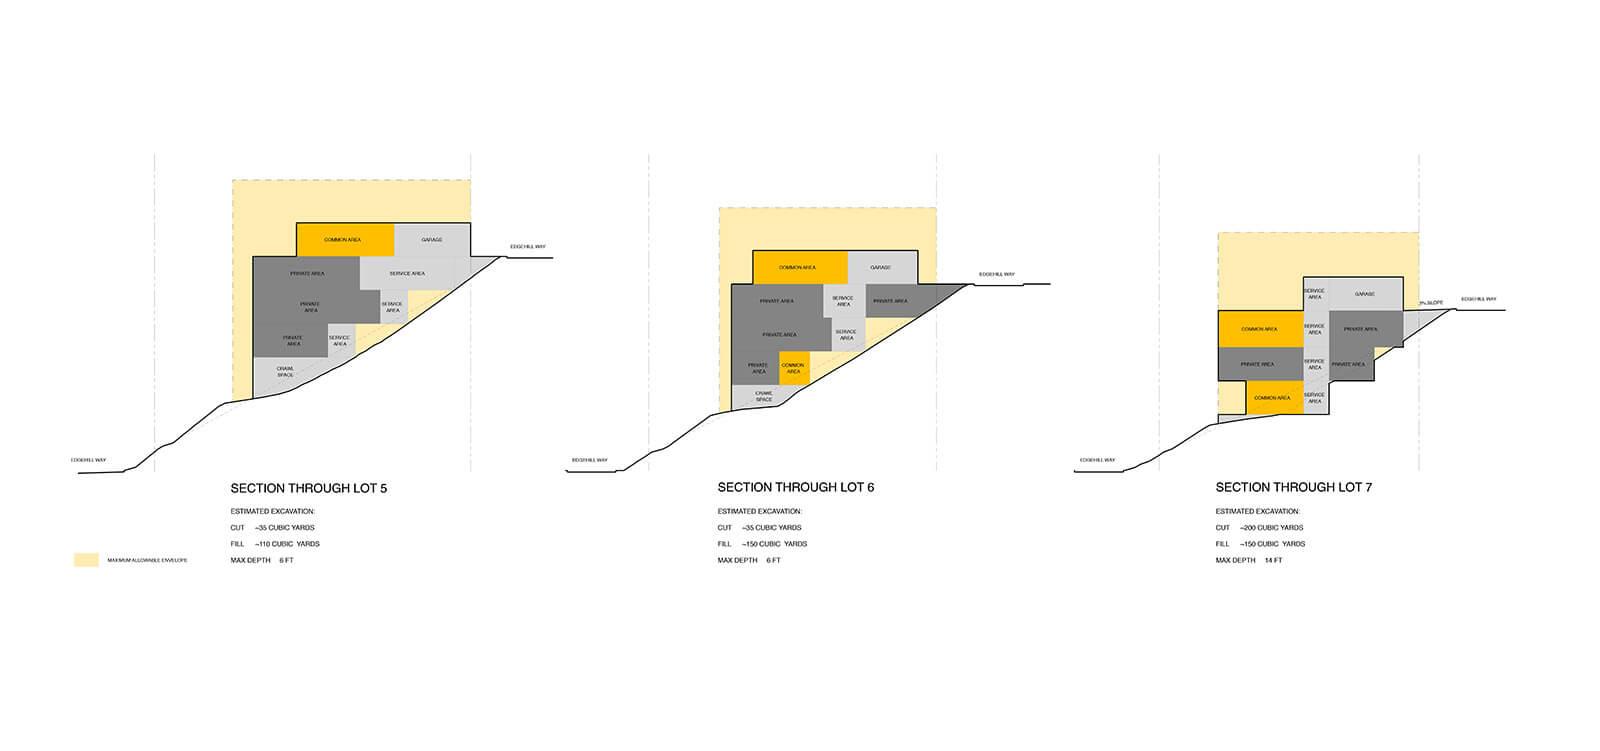 studio vara multifamily hillside master plan drawing section